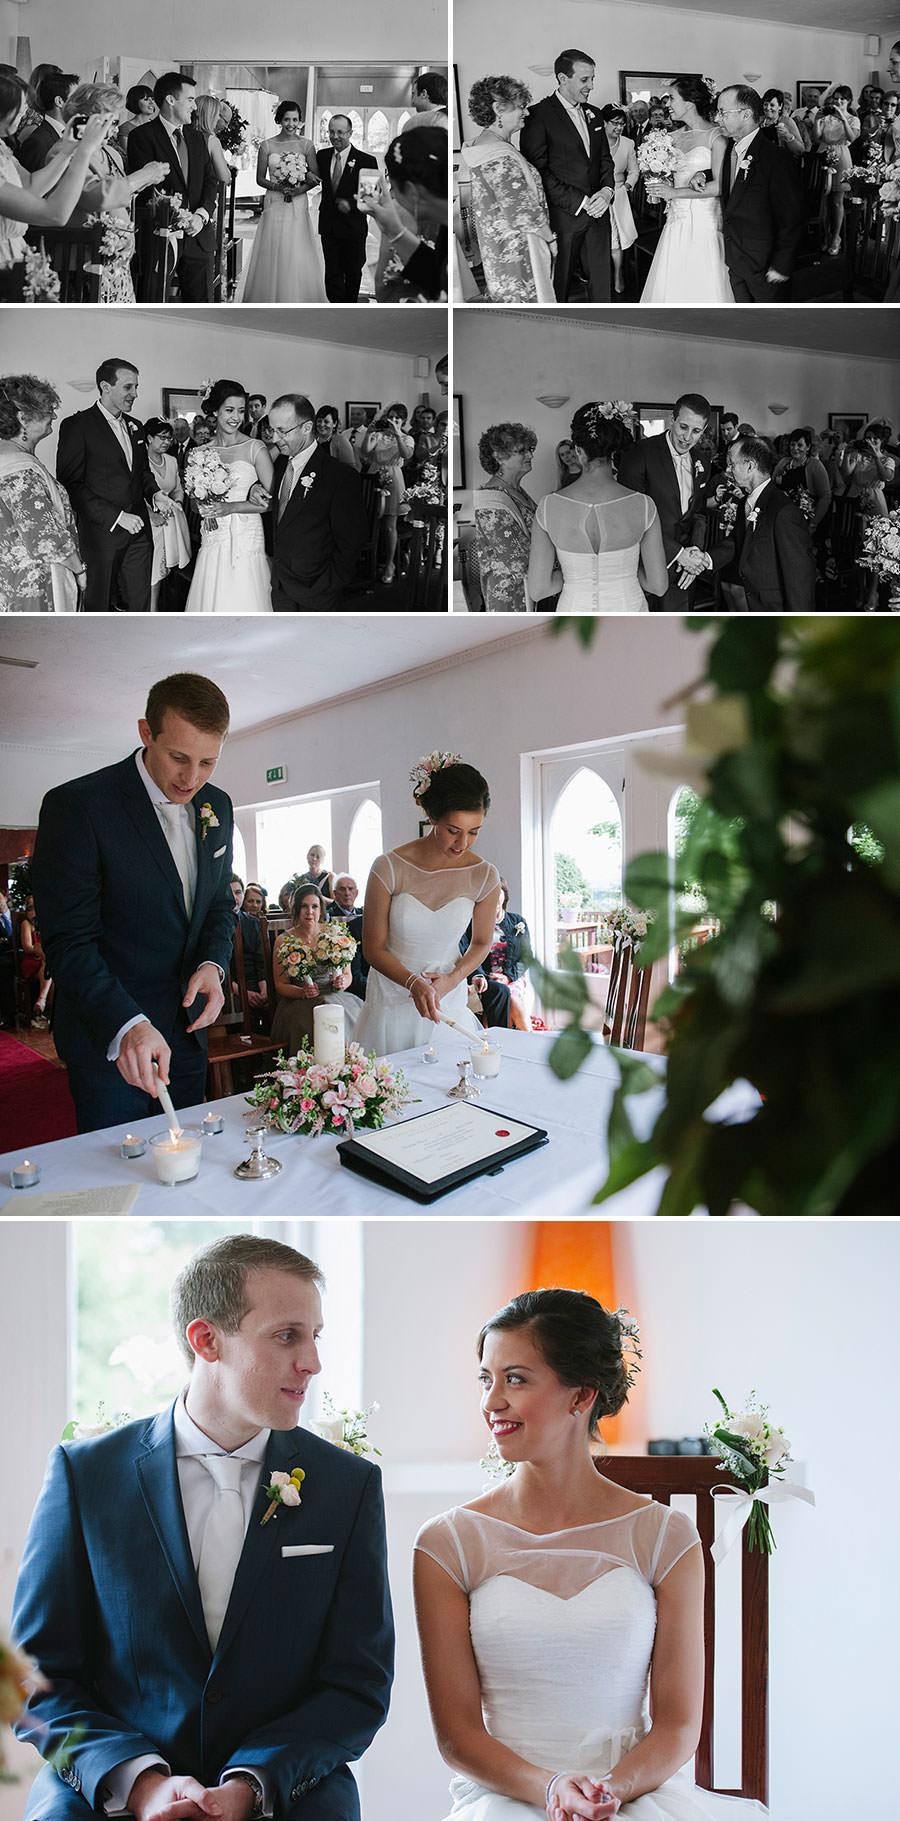 P + R | Barnabrow Country House Wedding | Irish - Australian Wedding | Cork Wedding Photography 7